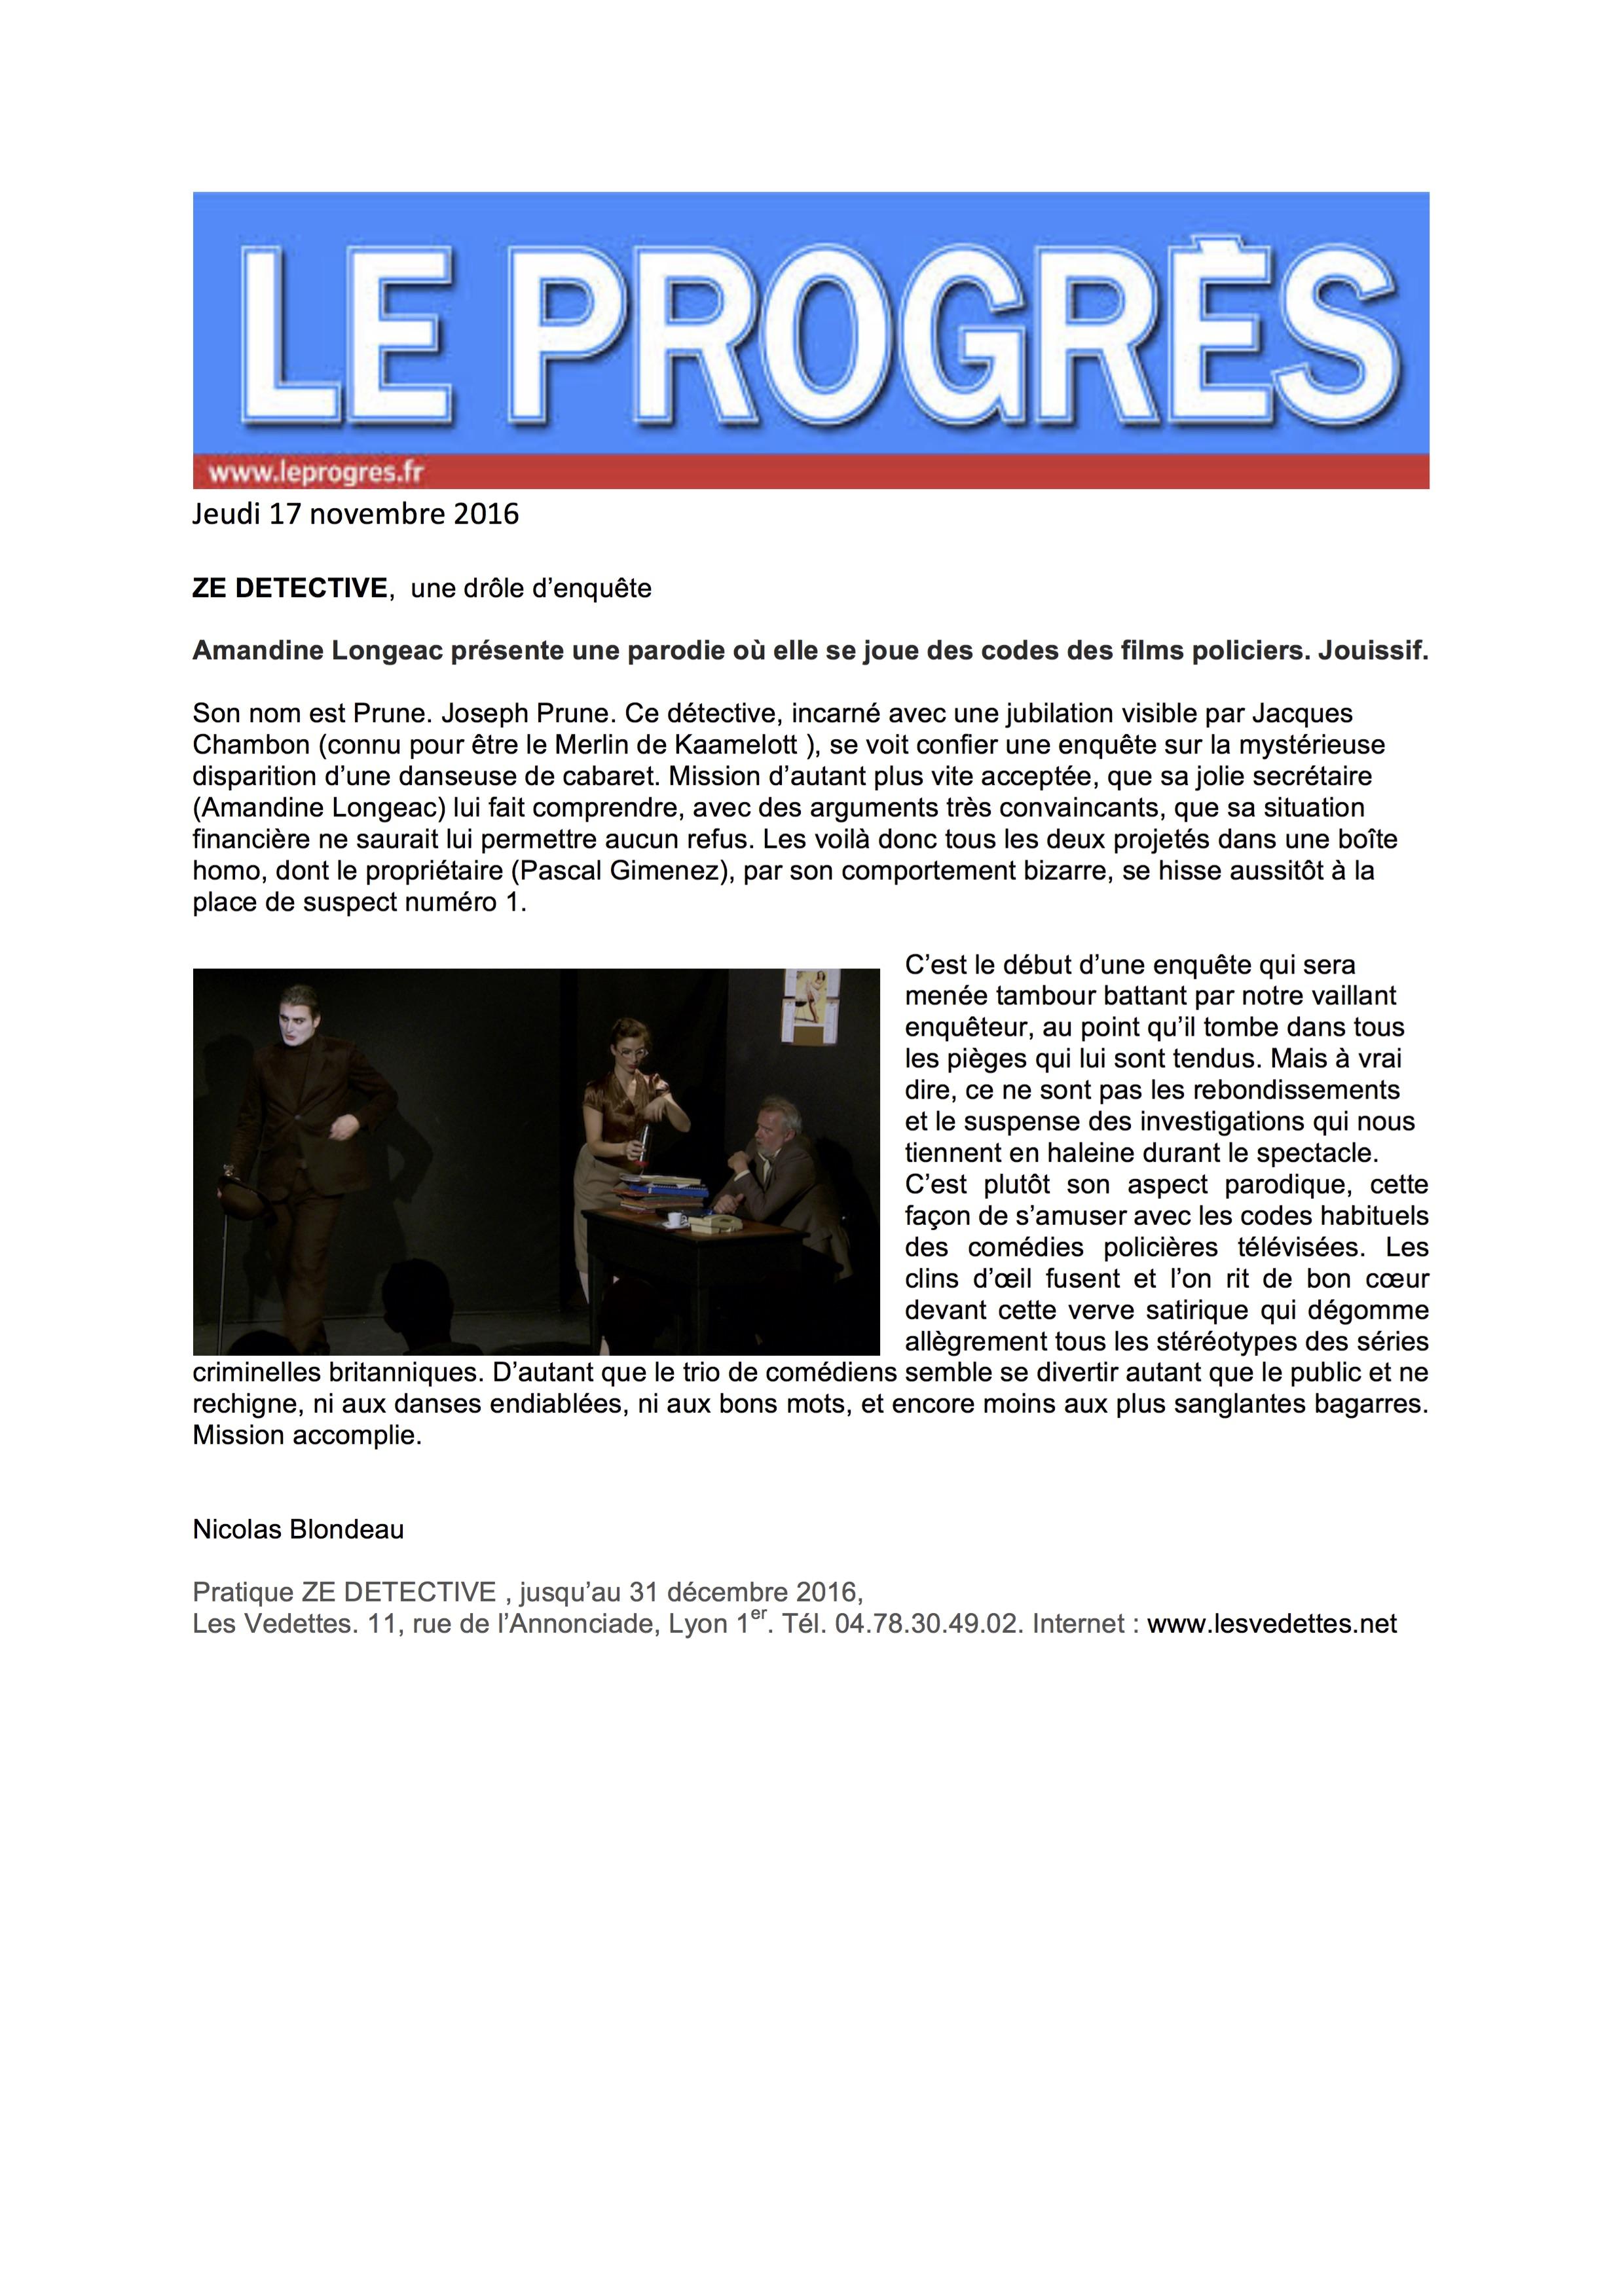 le-progres-nb-zed-du-17nov16